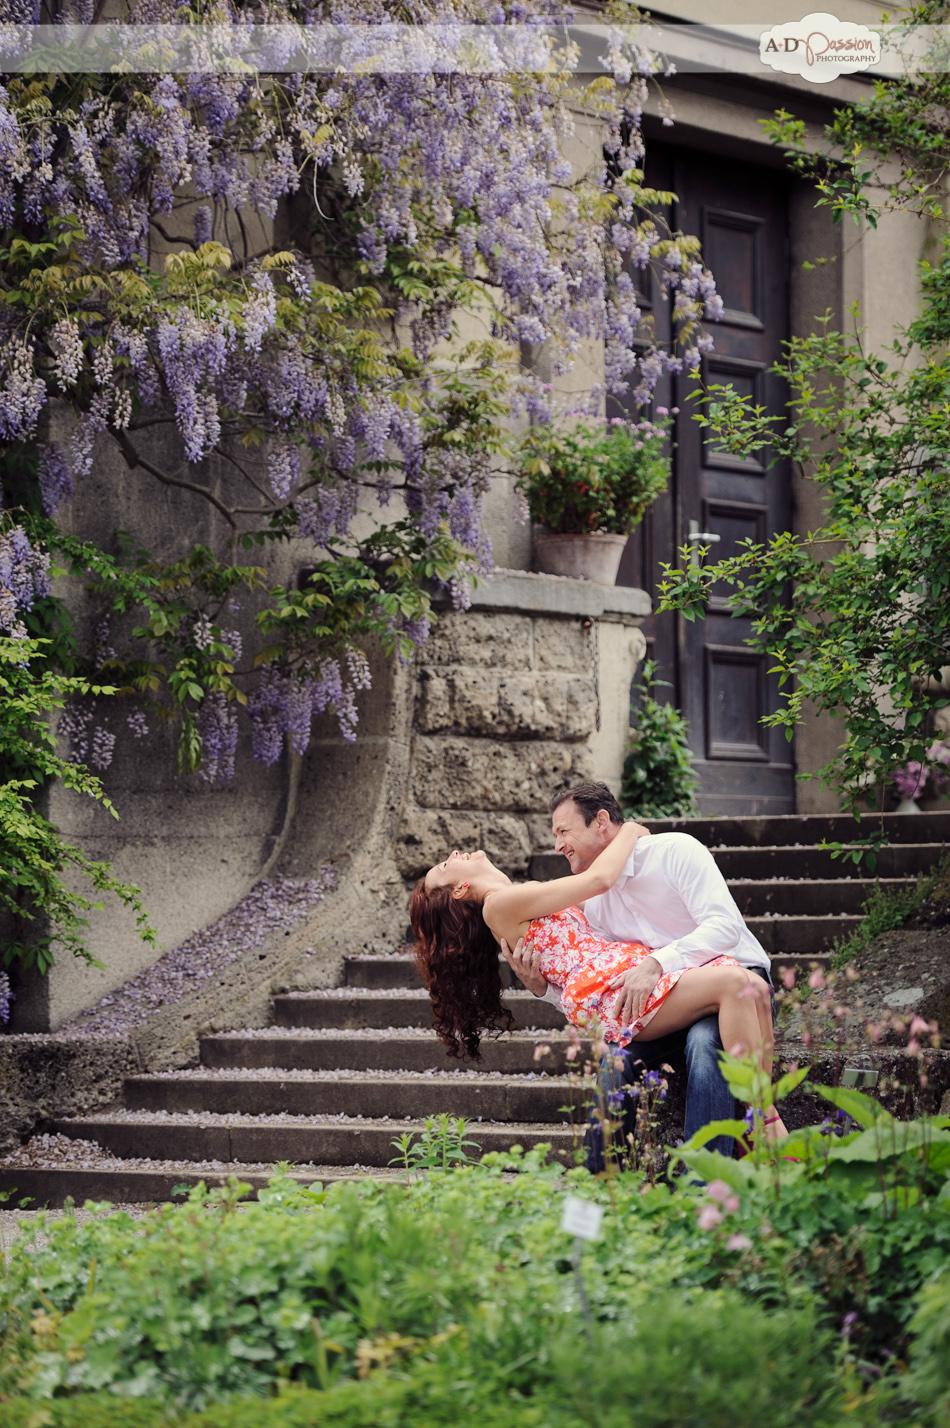 AD Passion Photography | fotograf-nunta_sedinta-foto-munchen_walter-si-cristina_0020 | Adelin, Dida, fotograf profesionist, fotograf de nunta, fotografie de nunta, fotograf Timisoara, fotograf Craiova, fotograf Bucuresti, fotograf Arad, nunta Timisoara, nunta Arad, nunta Bucuresti, nunta Craiova